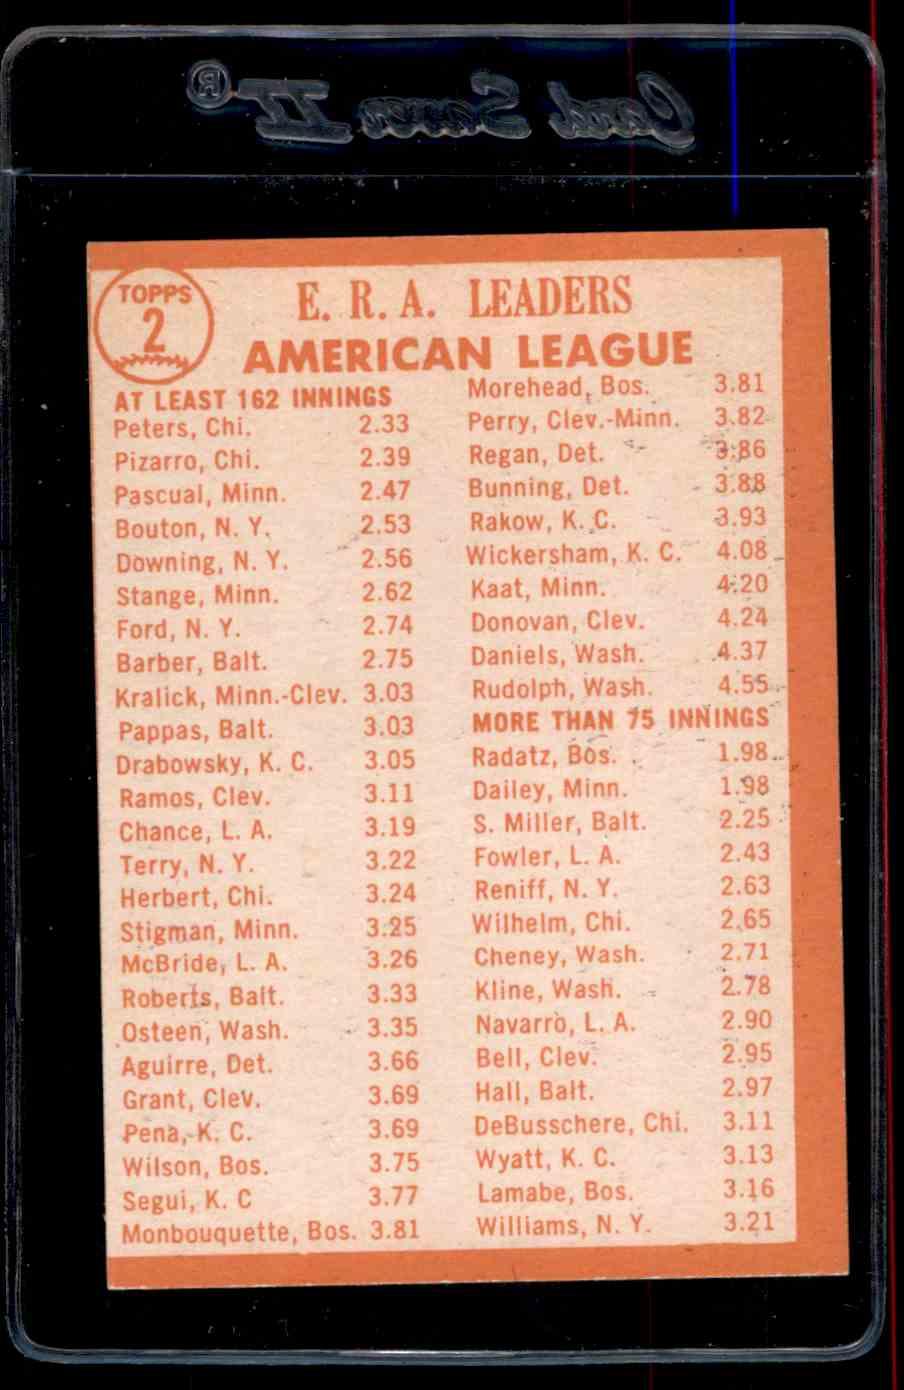 1964-65 Topps Era Leaders Nm-Mt card back image